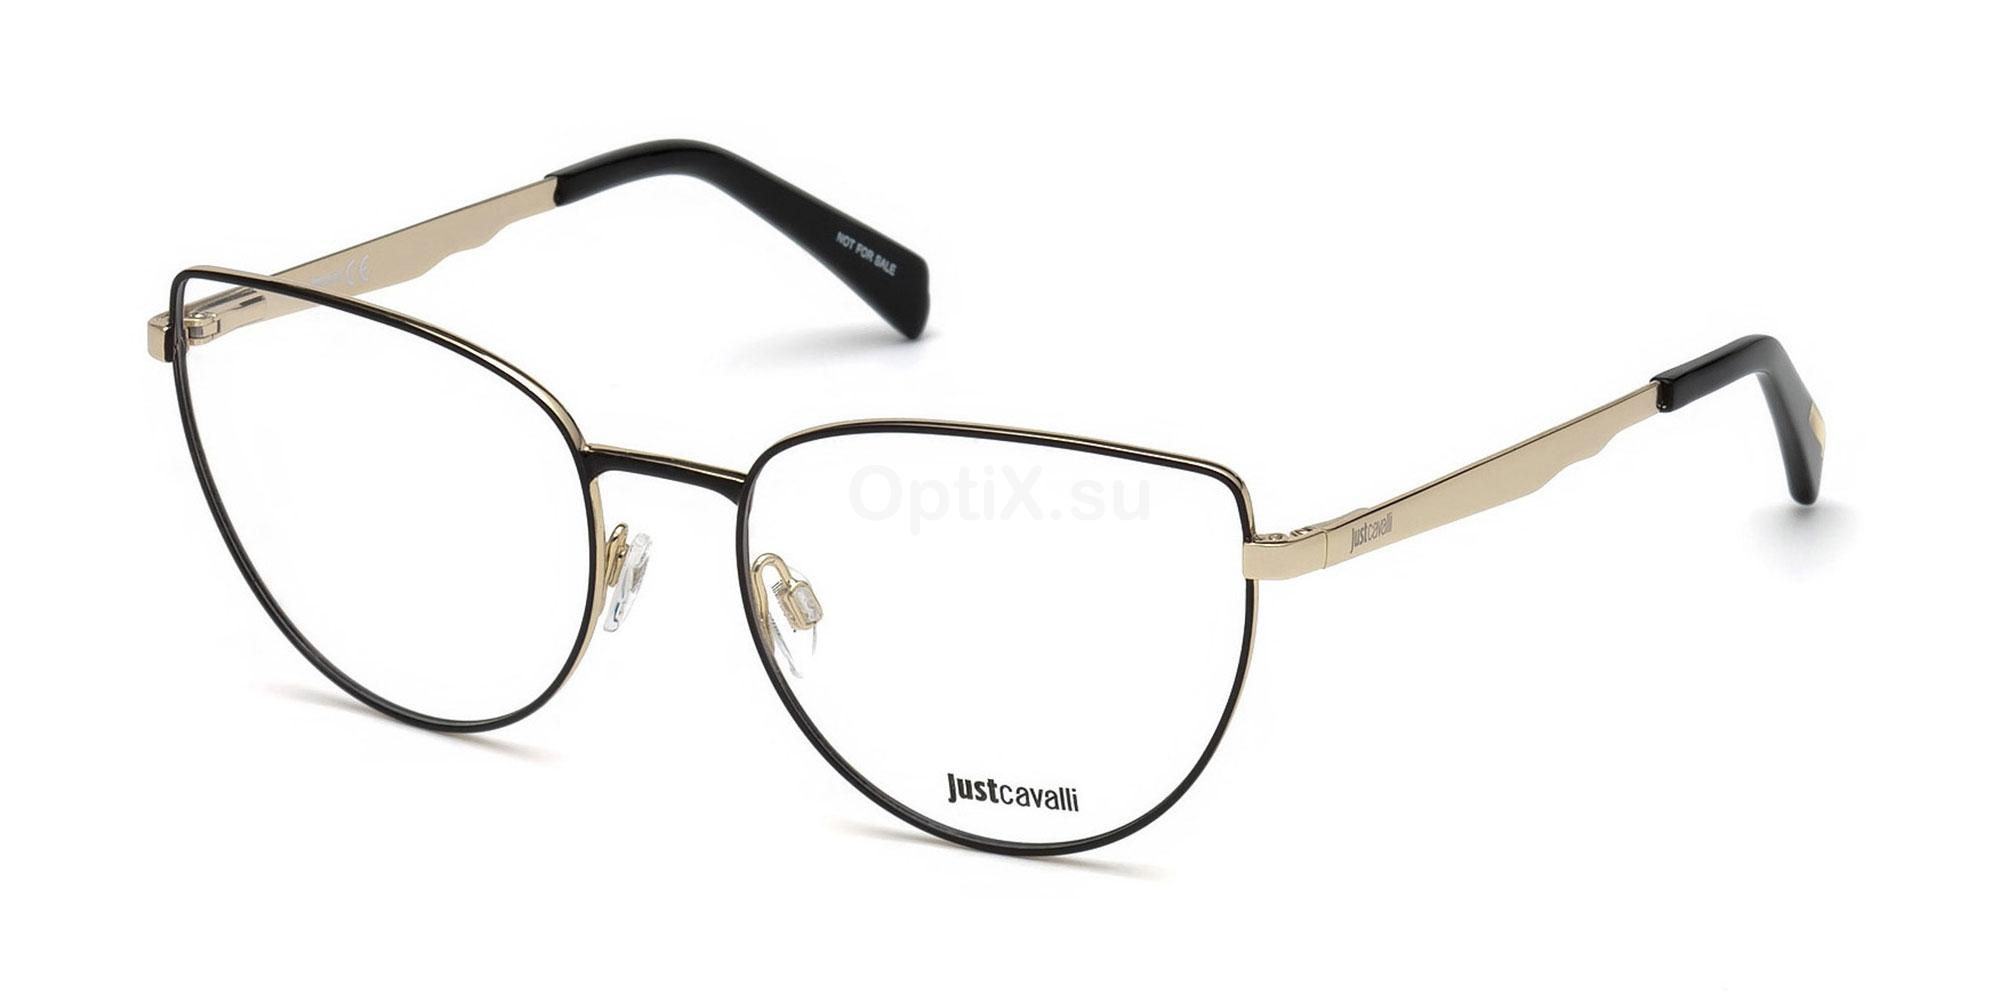 005 JC0850 Glasses, Just Cavalli